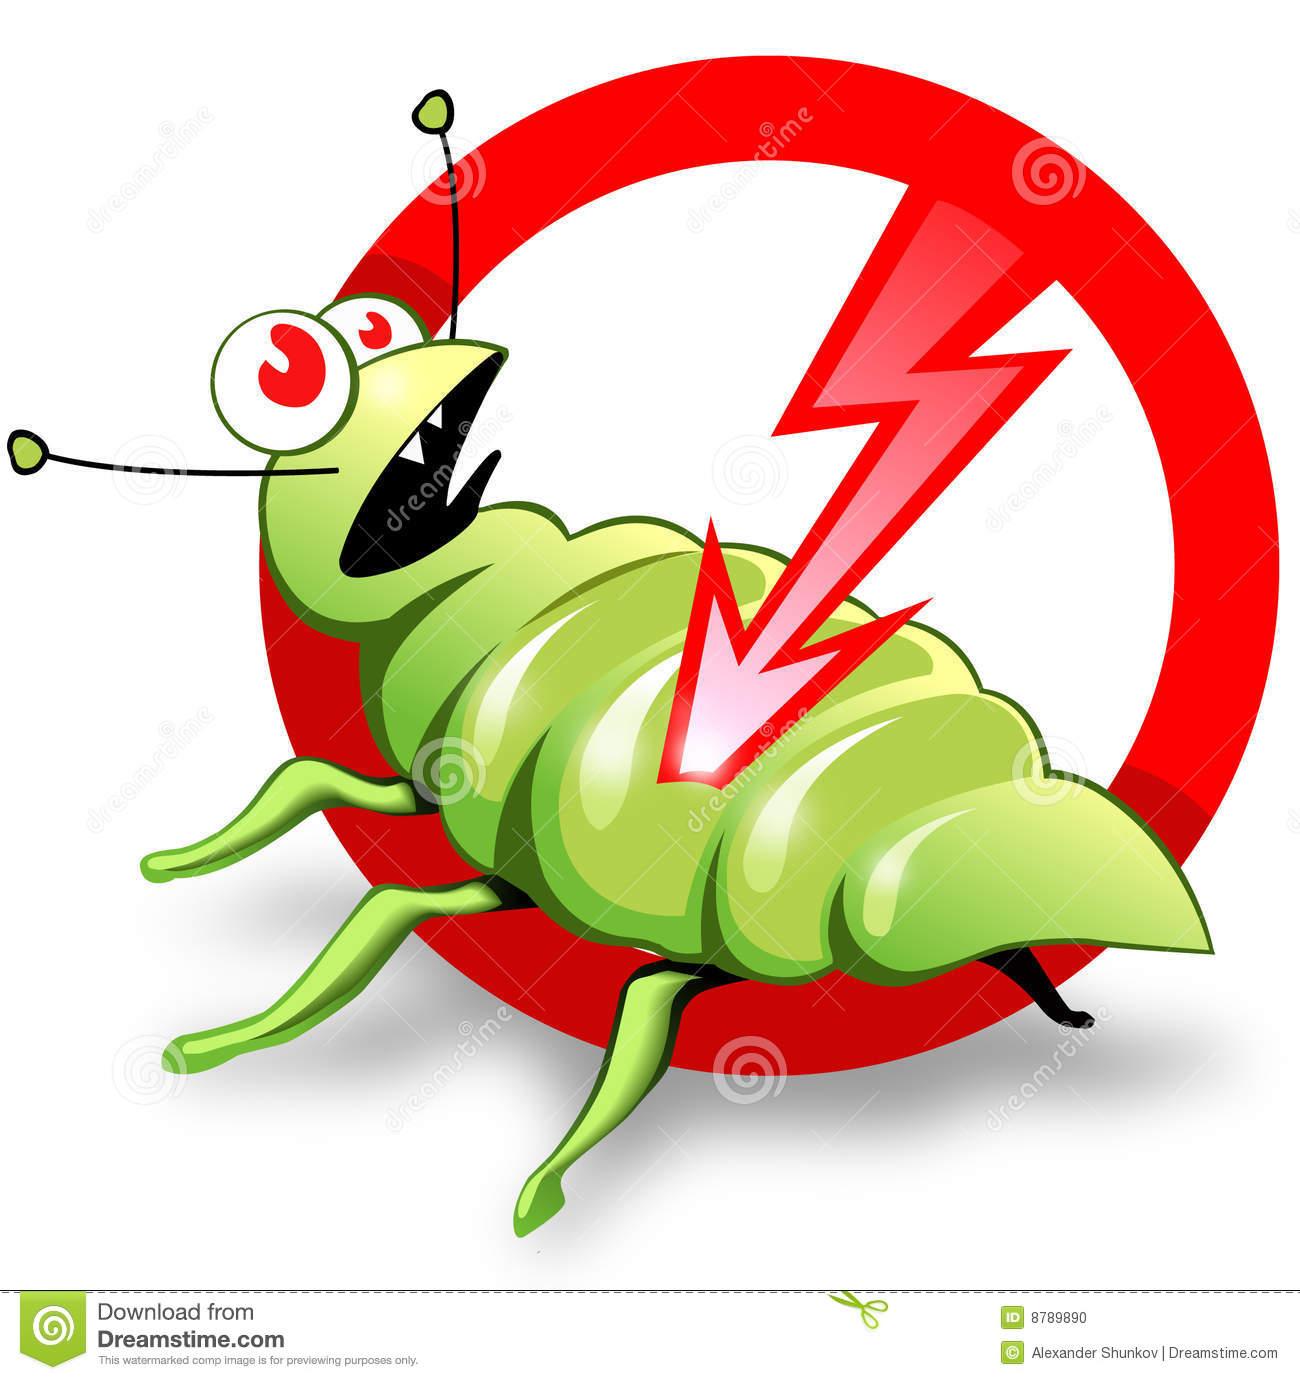 Pest control man clipart.